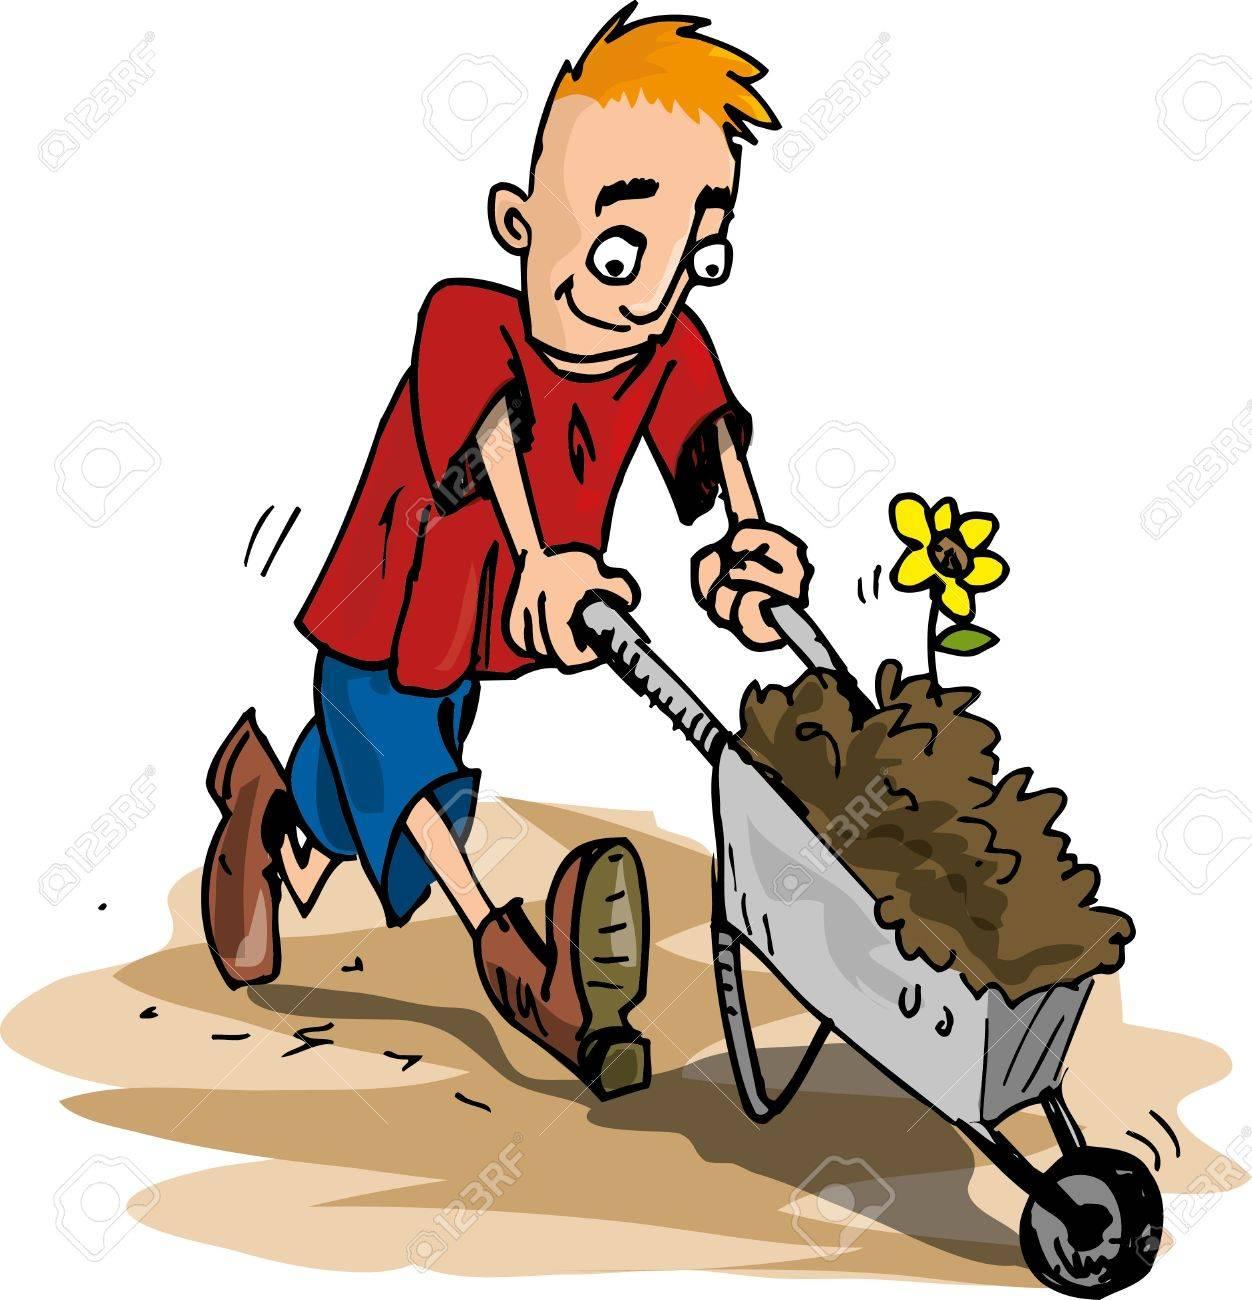 Cartoon Pics of Gardening Cartoon Gardener Cartoon